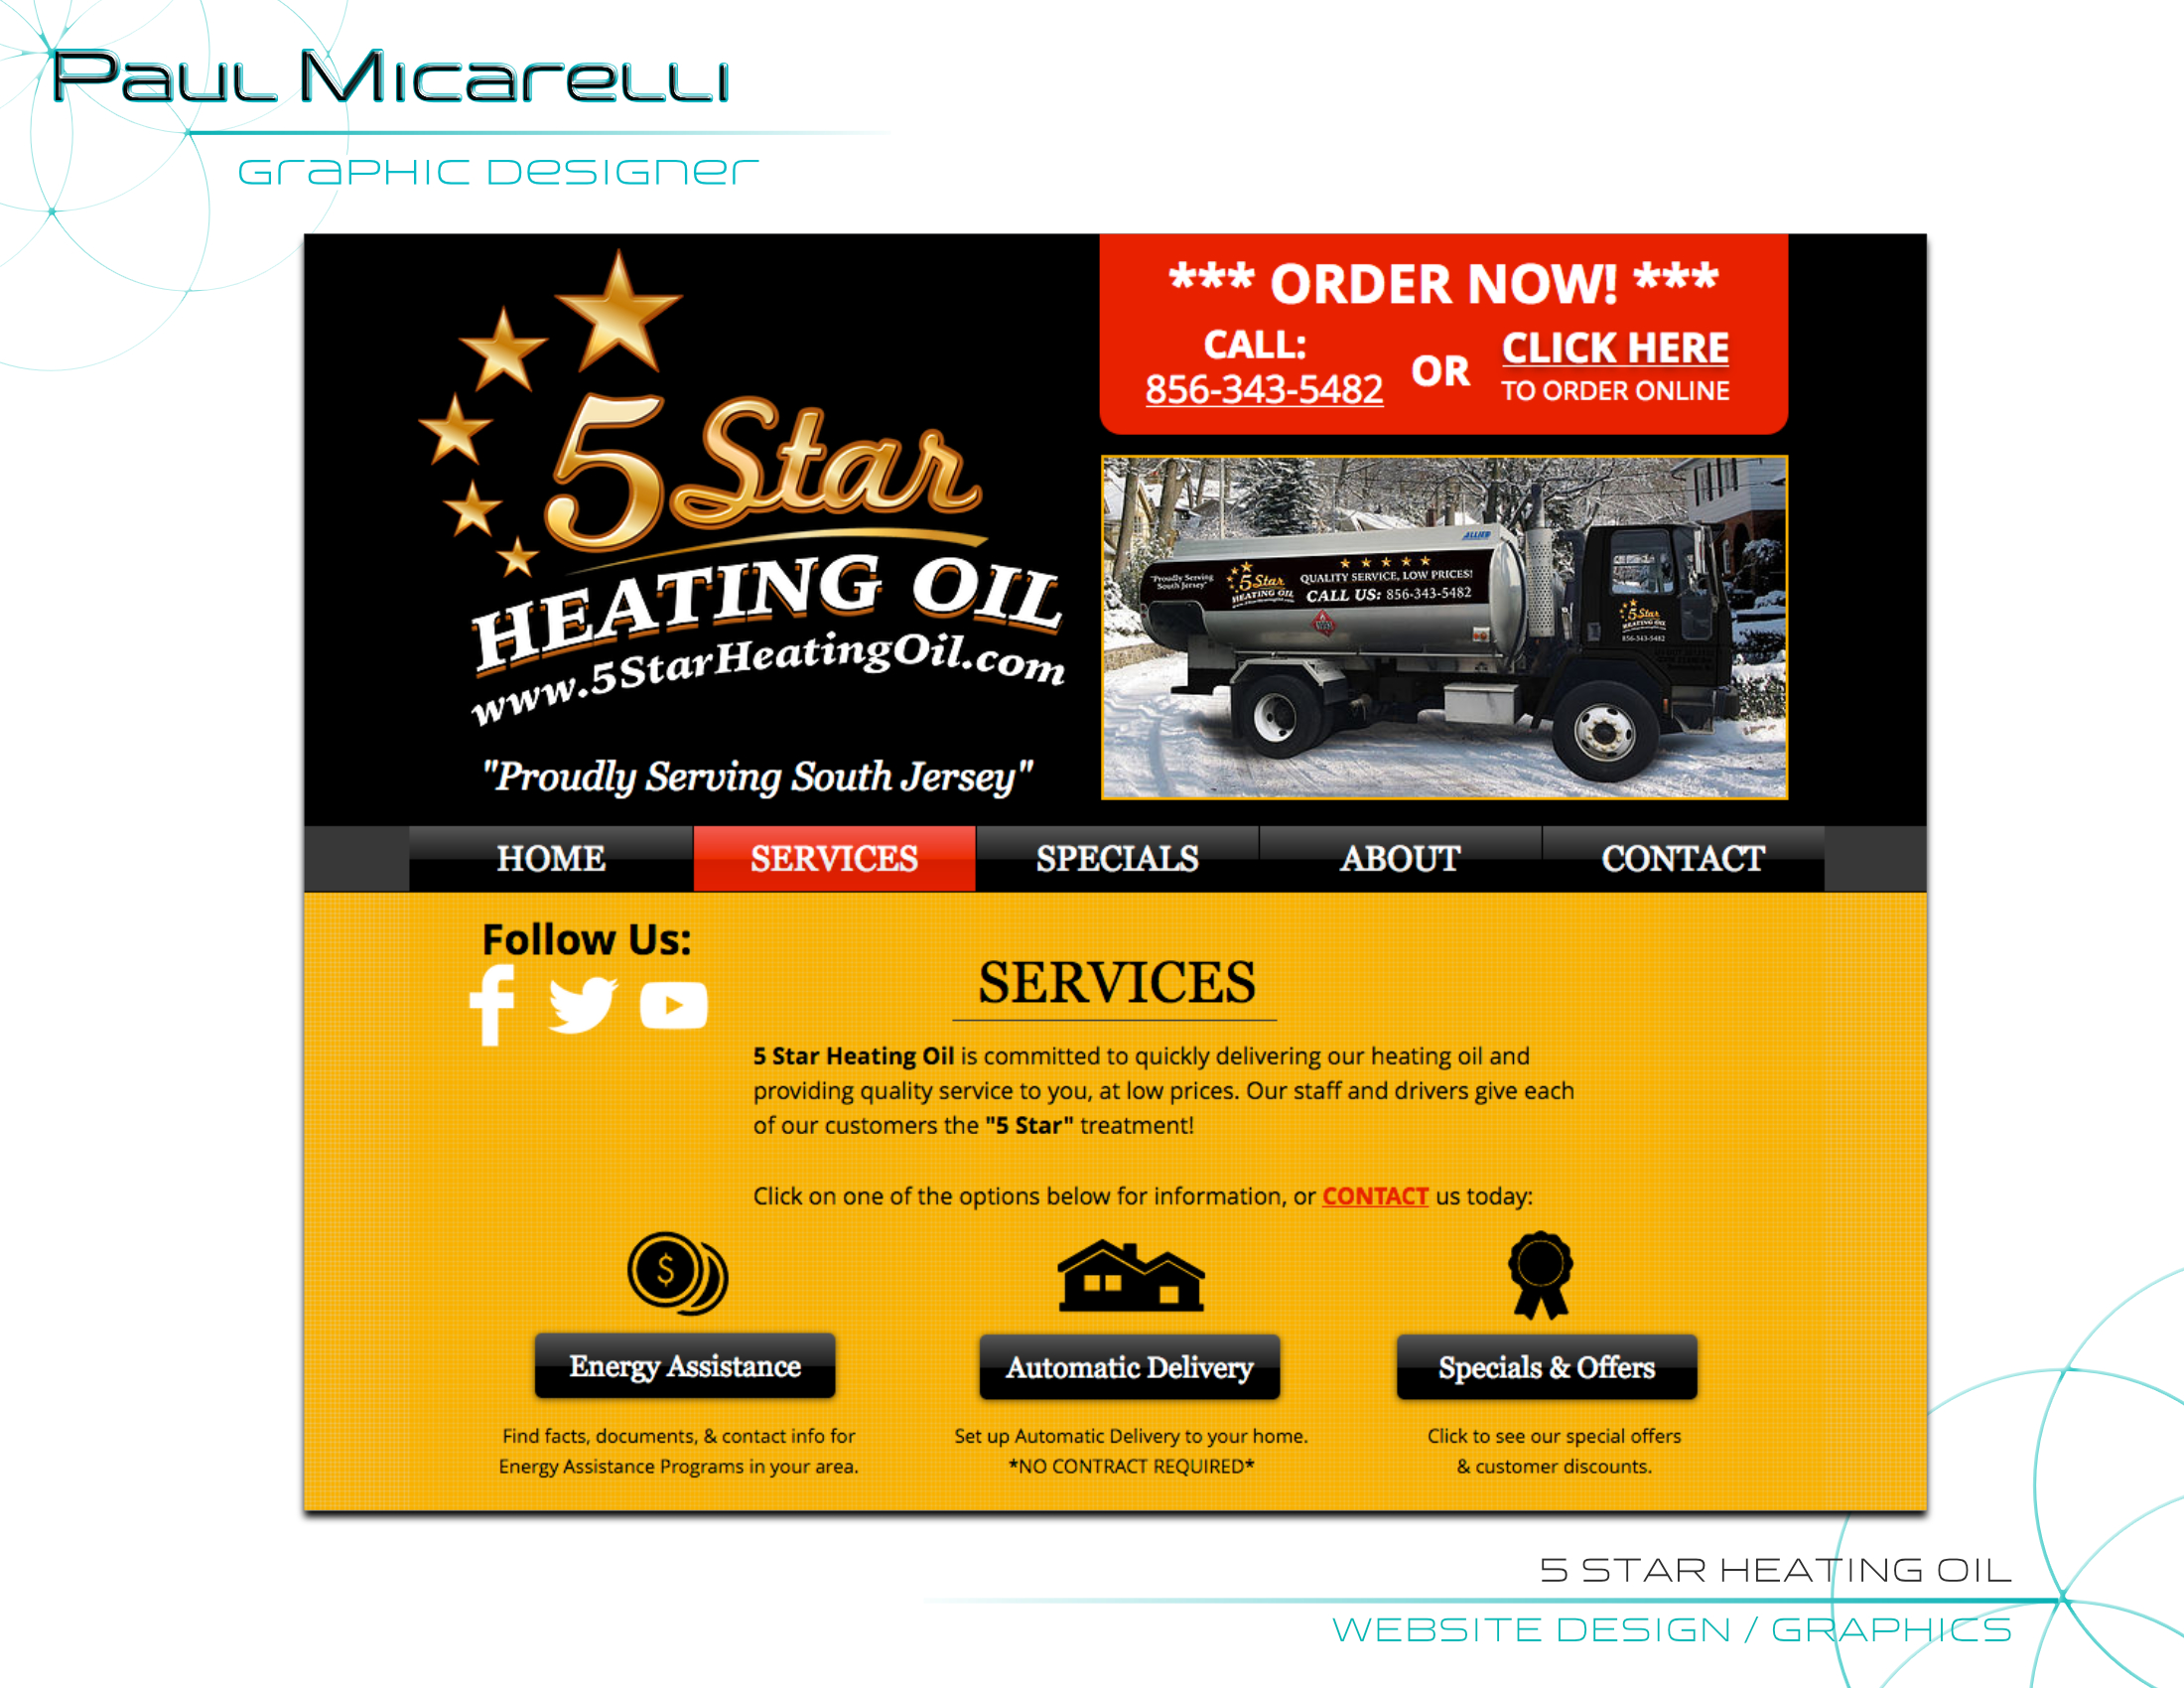 Paul-Micarelli-5 Star Heating Oil Websit